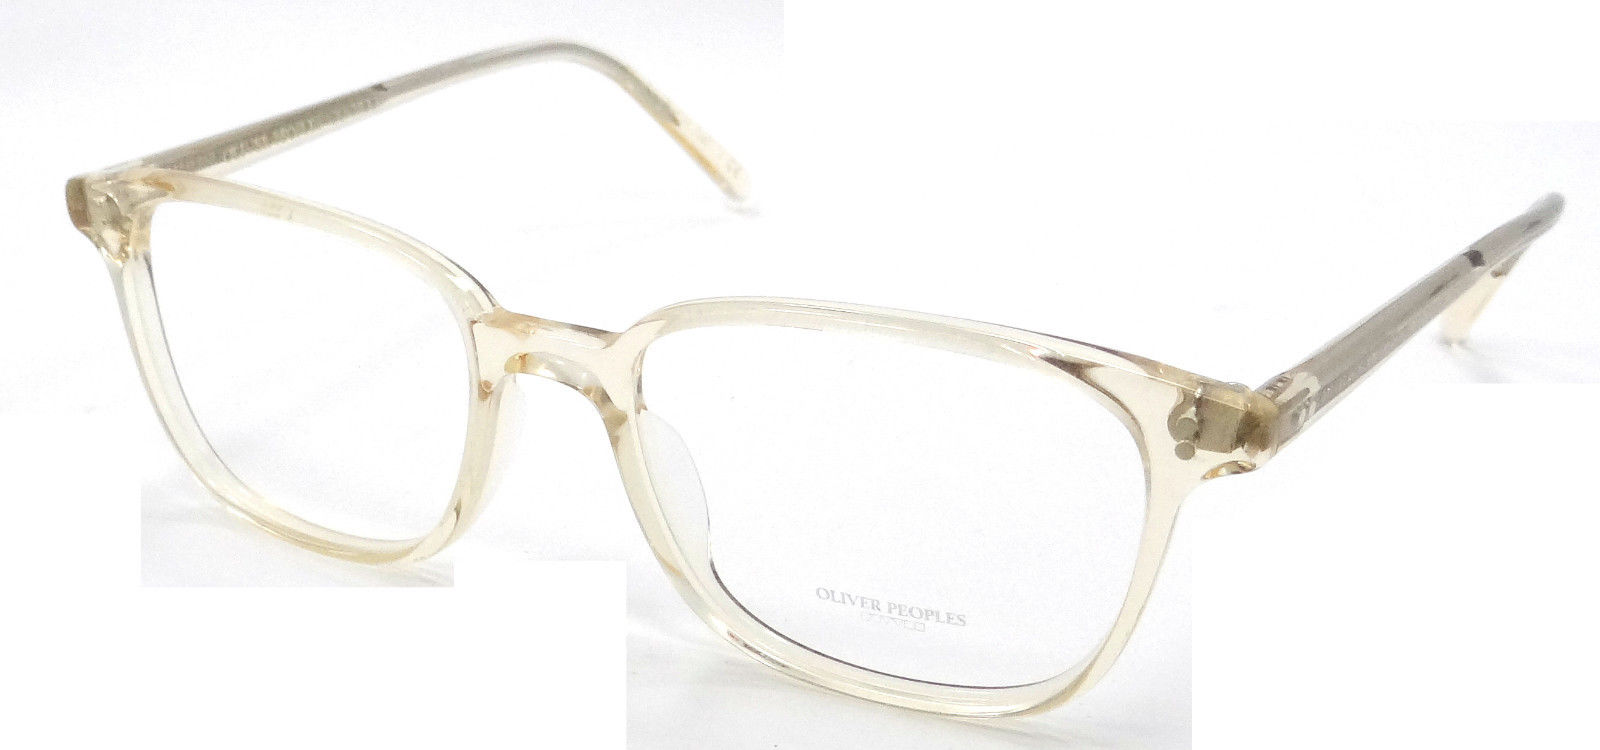 4b0b1dfa9c Oliver Peoples OV 5279U Maslon 1094 Translucent Buff Eyeglasses -  Walmart.com